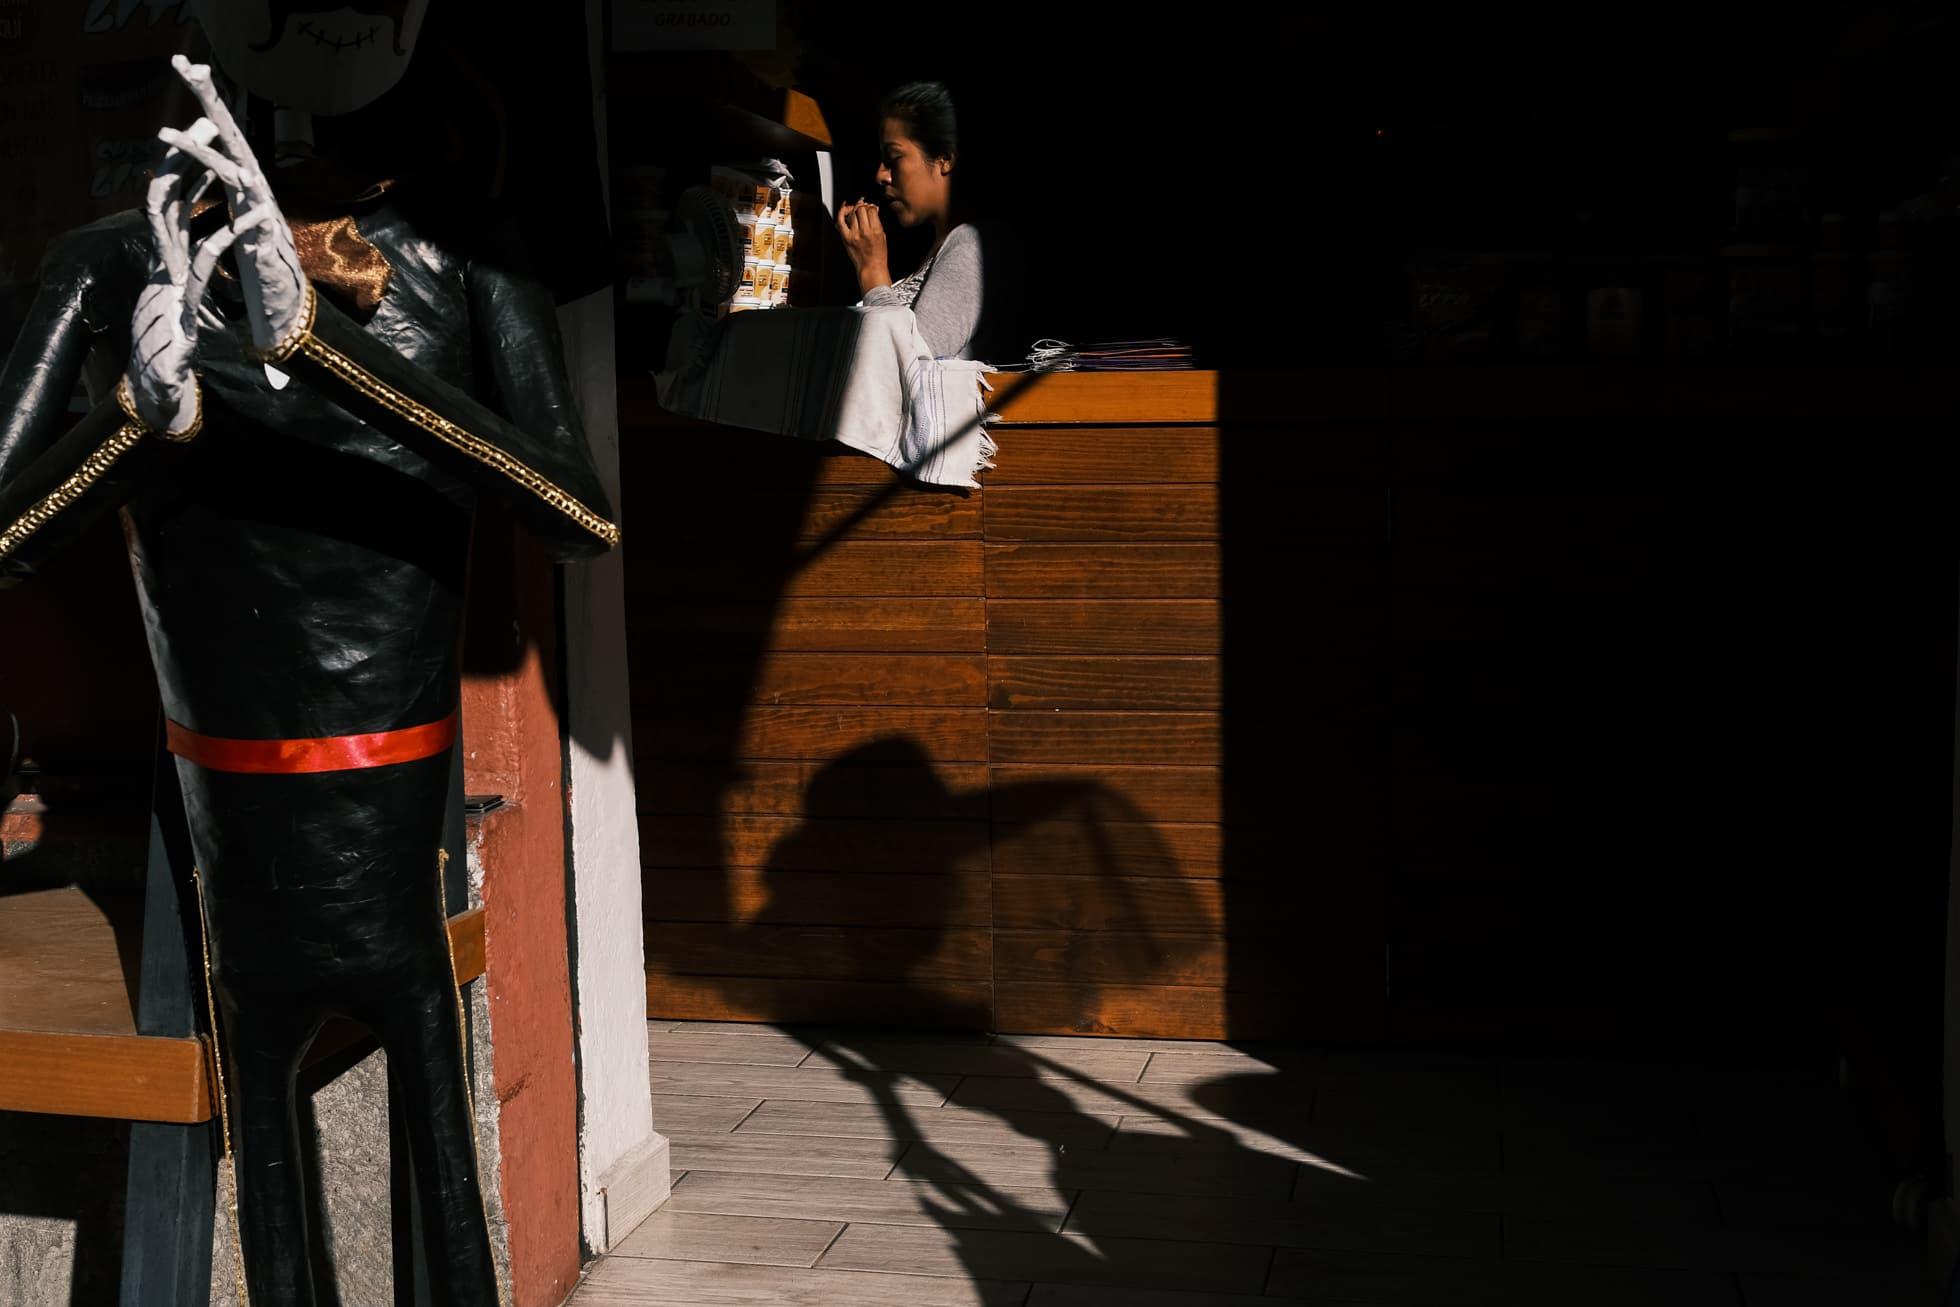 fujifilm-x-pro3-mexico-street-photography-73